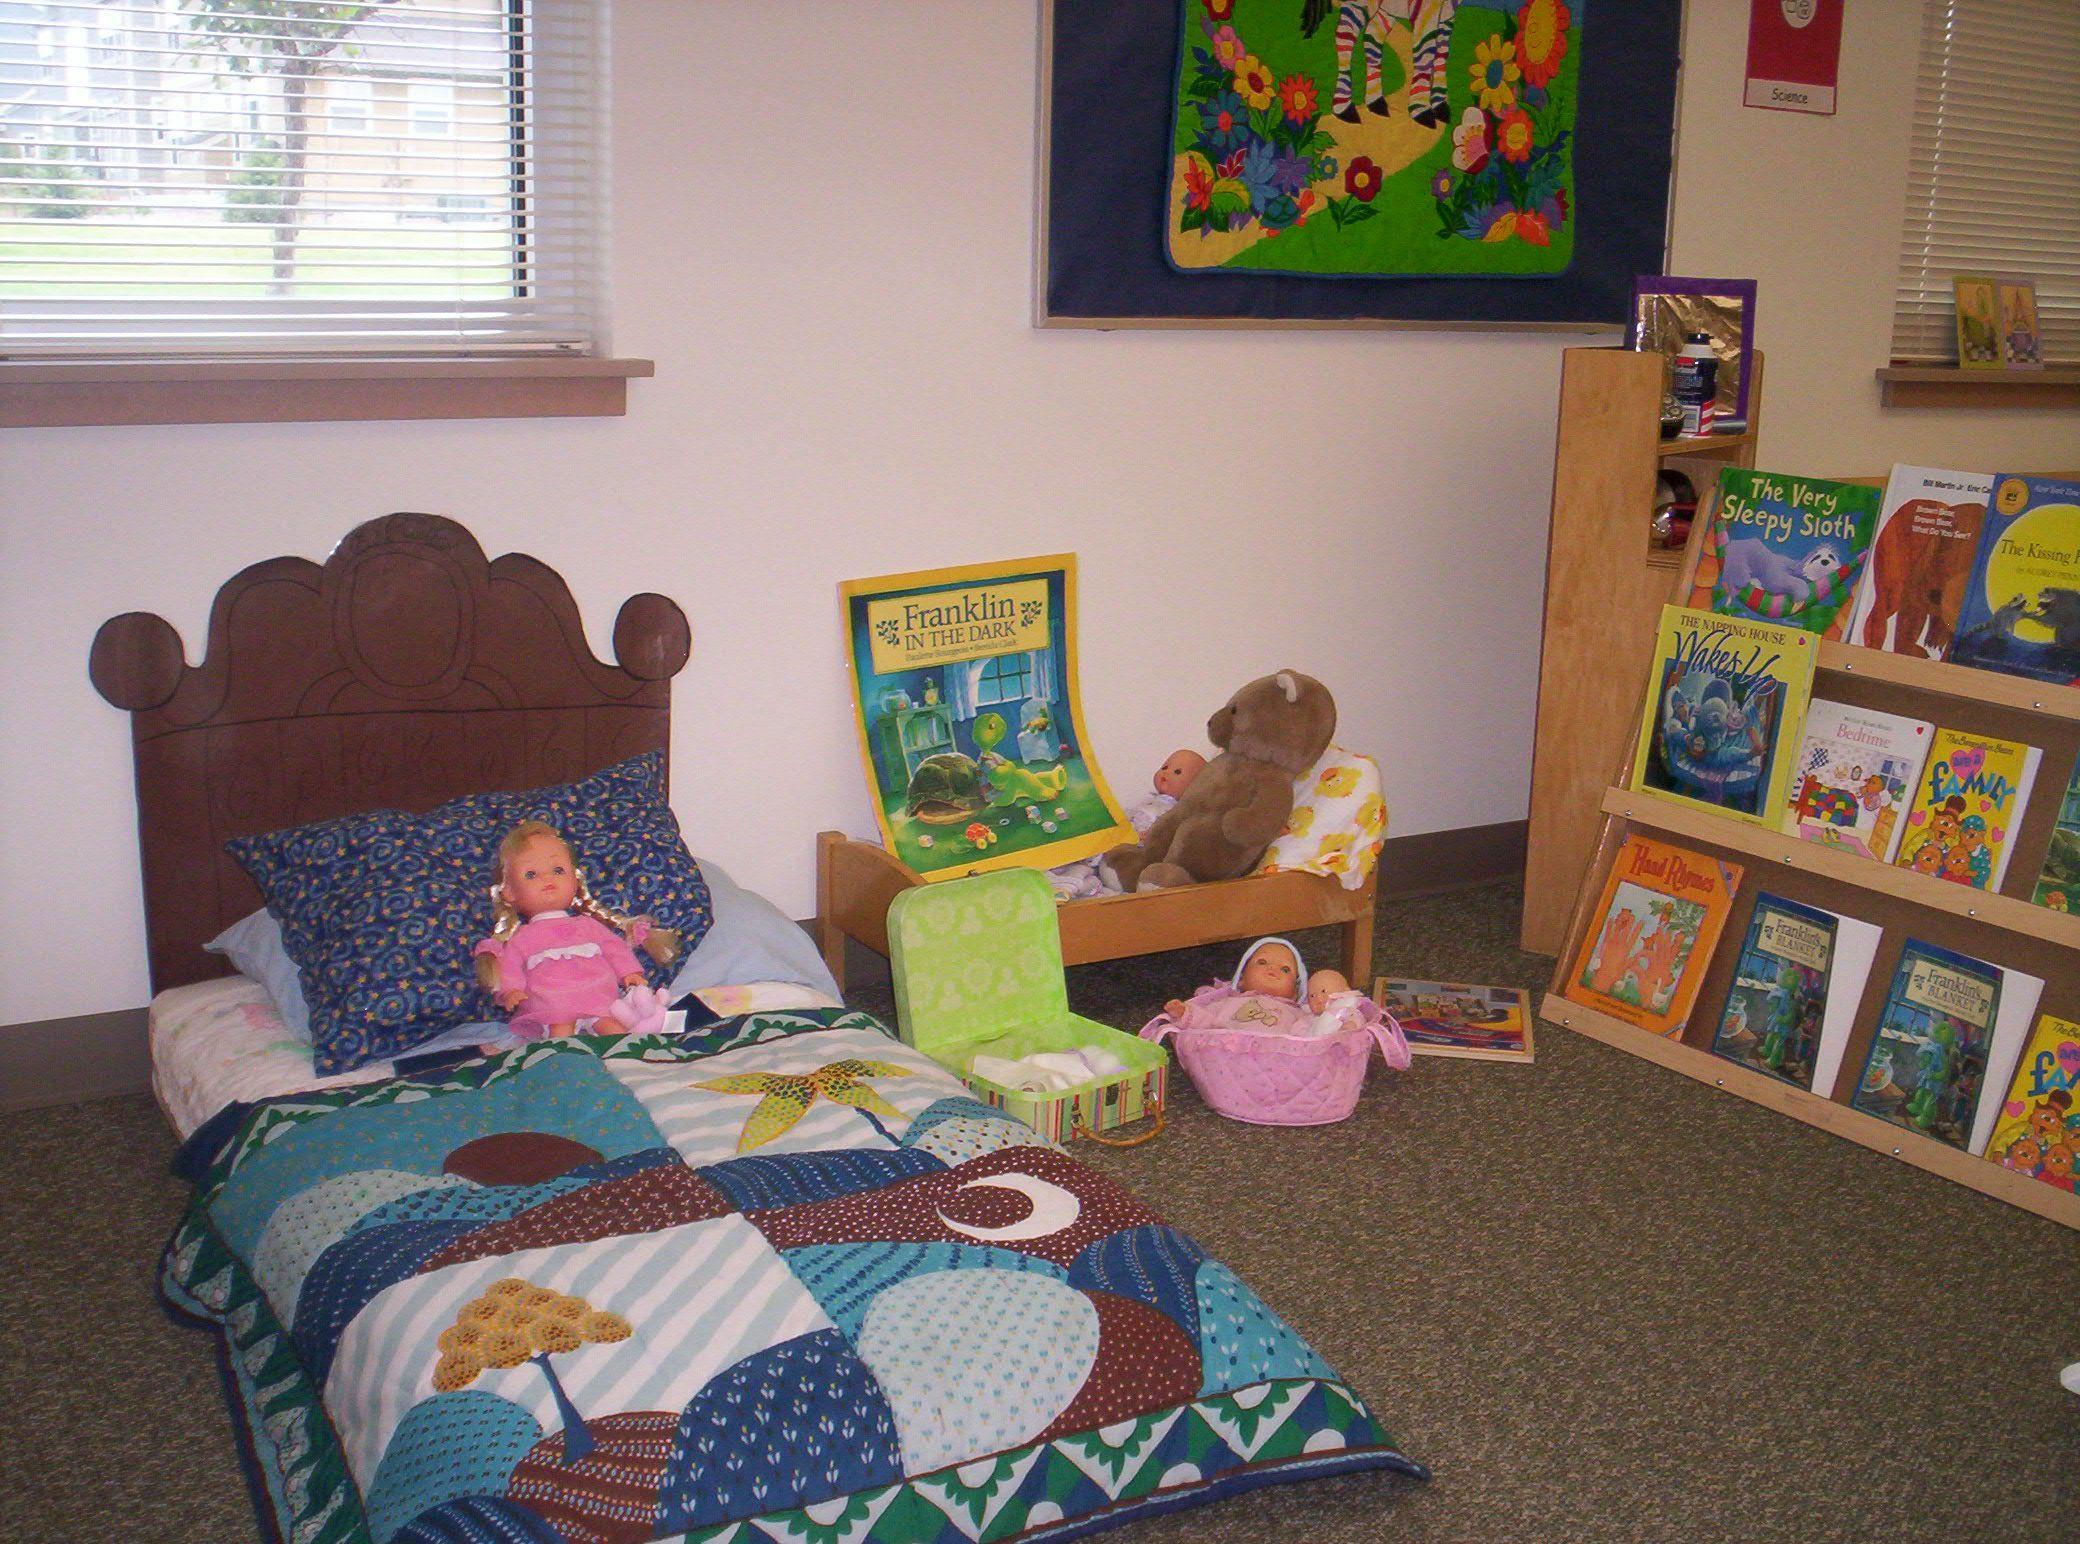 Best Bedroom Paper Headboard Nap Mat Blankets And Books 400 x 300